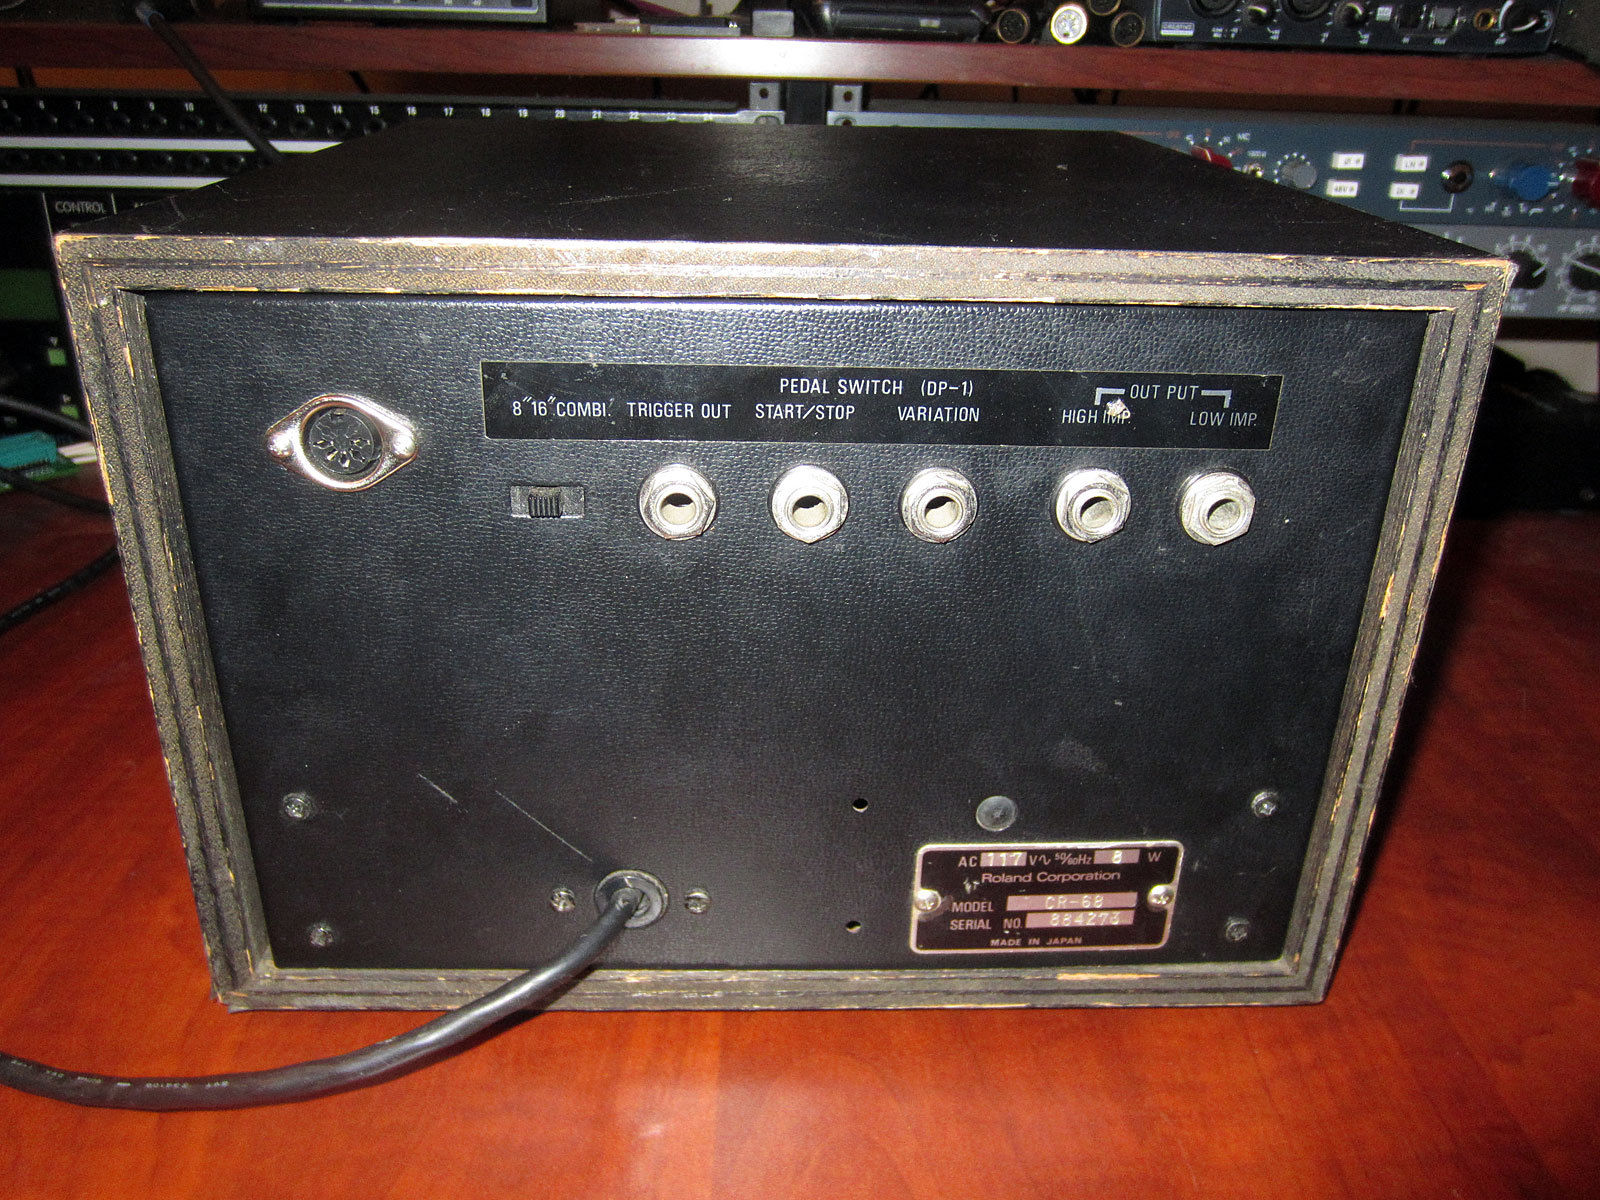 MATRIXSYNTH: Roland CR-68 Analog Drum Machine With MIDI Input